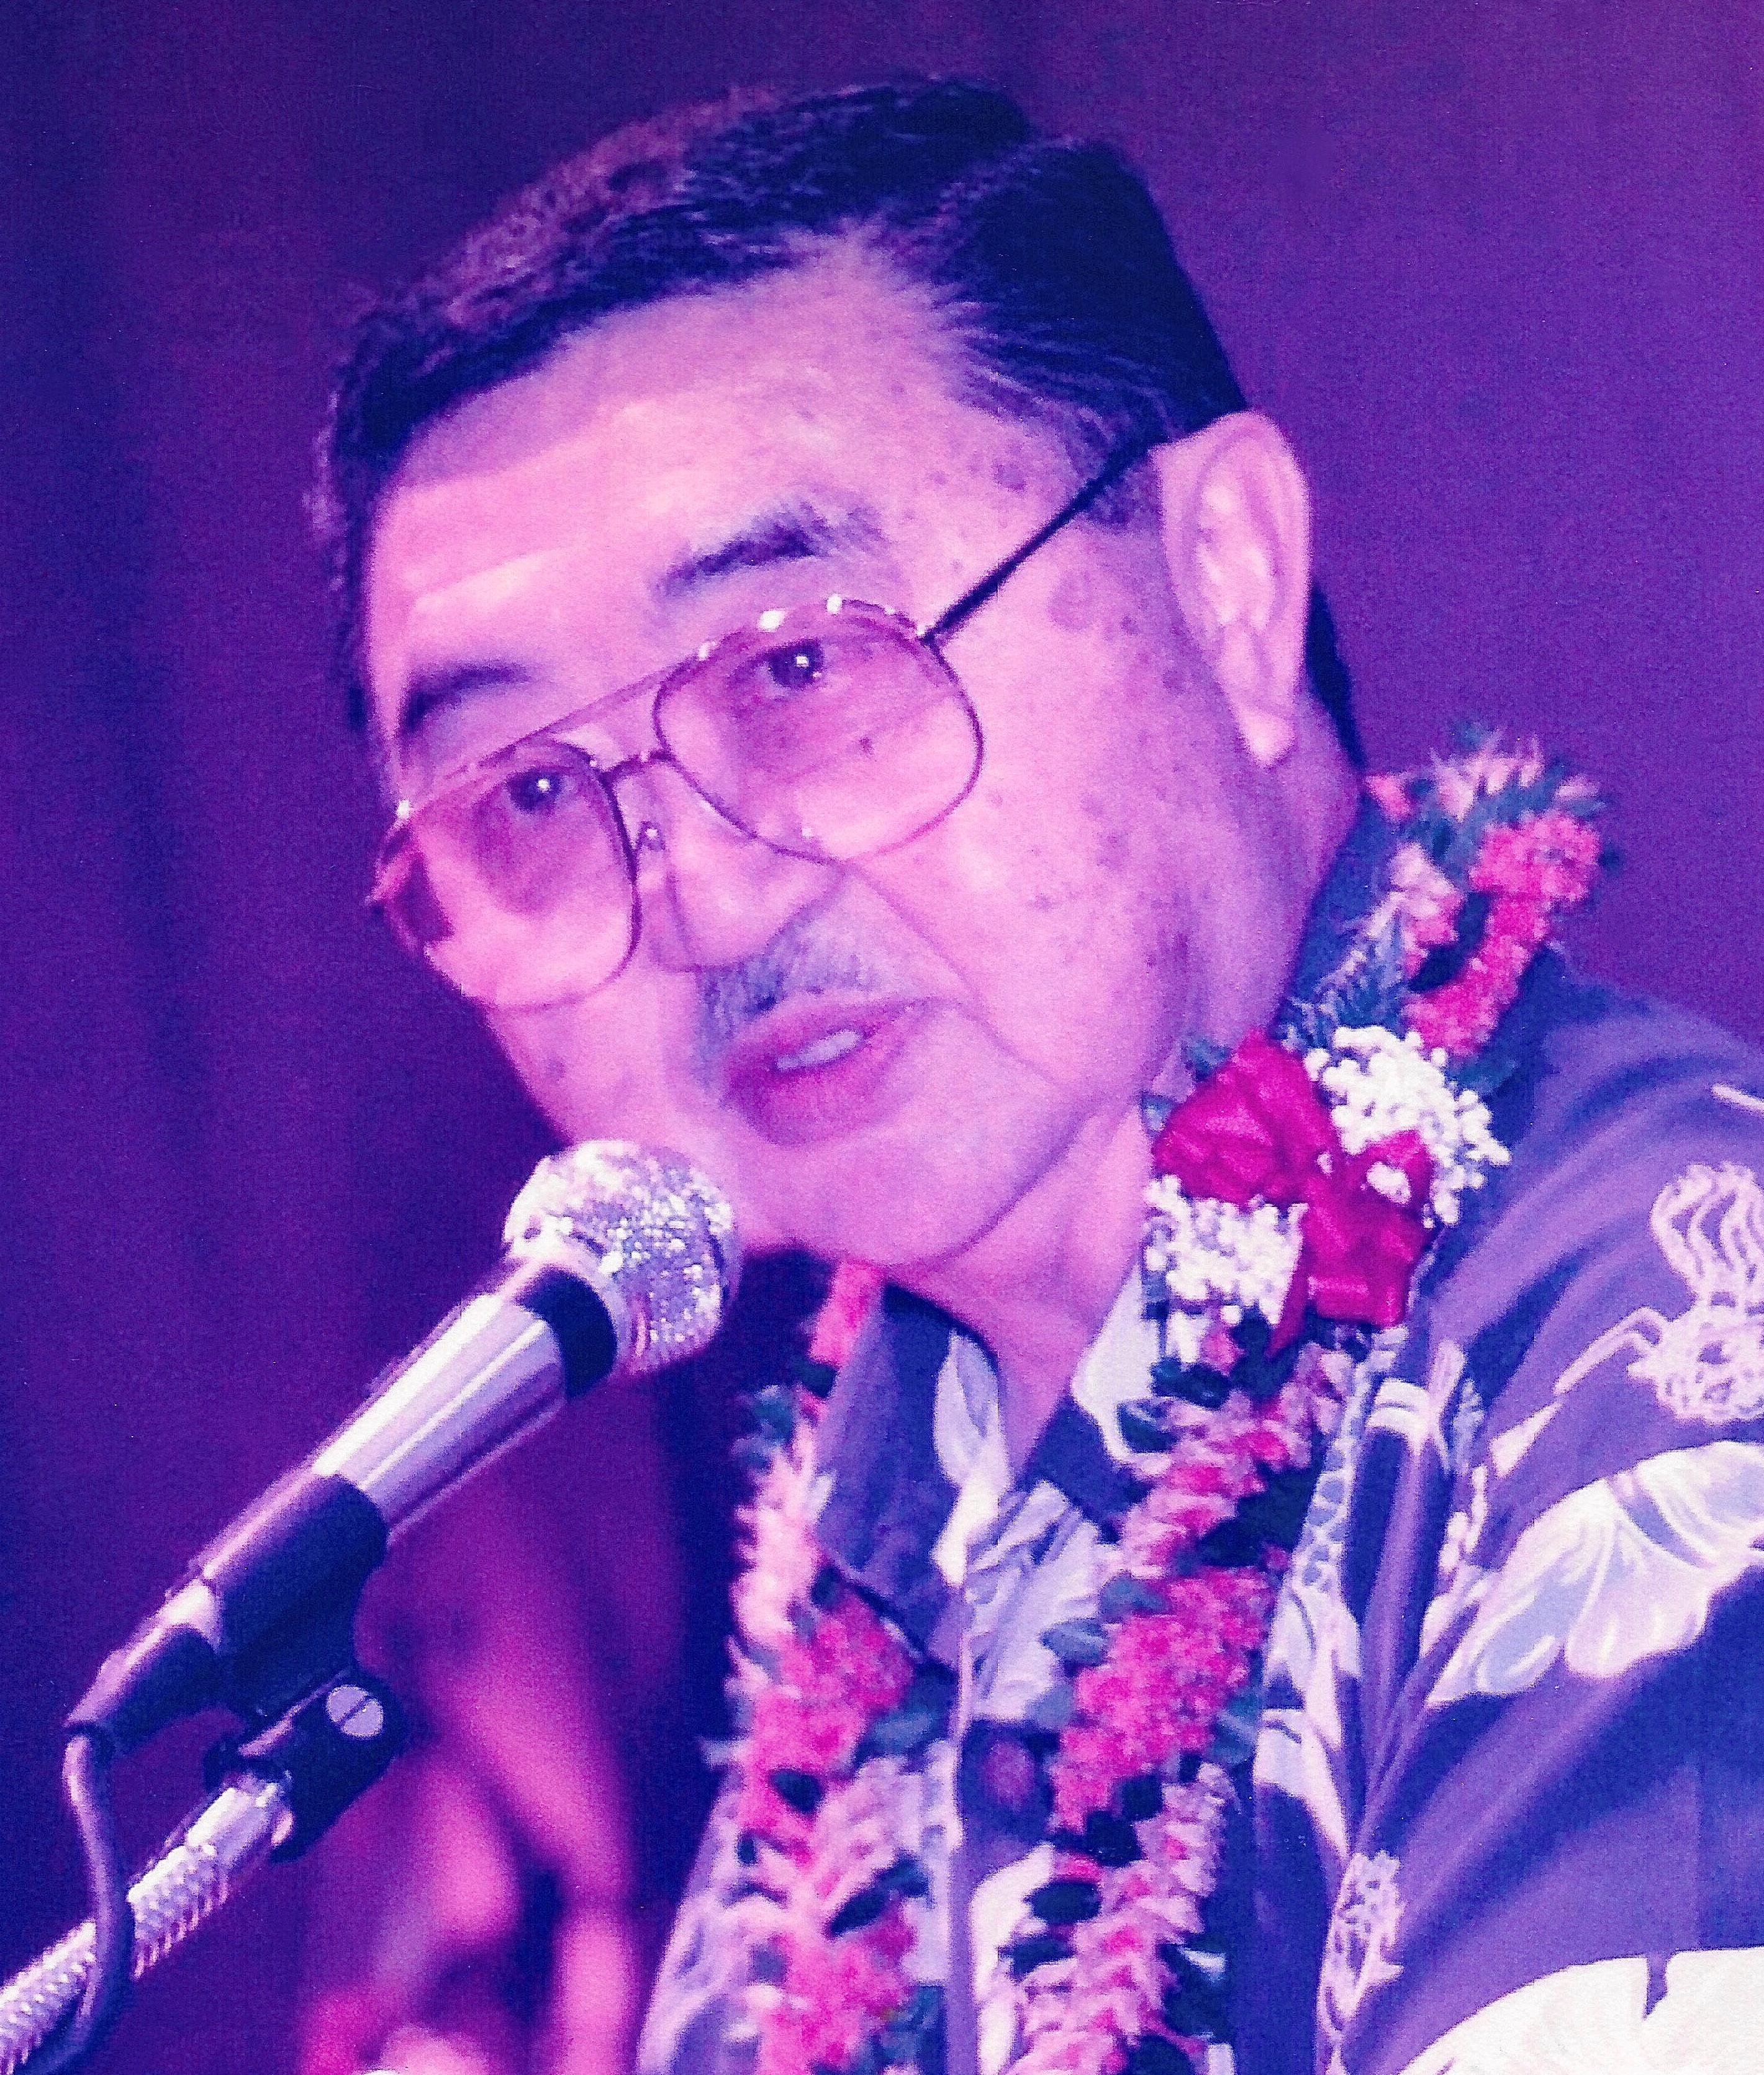 RICHARD HIROSHI TAISE